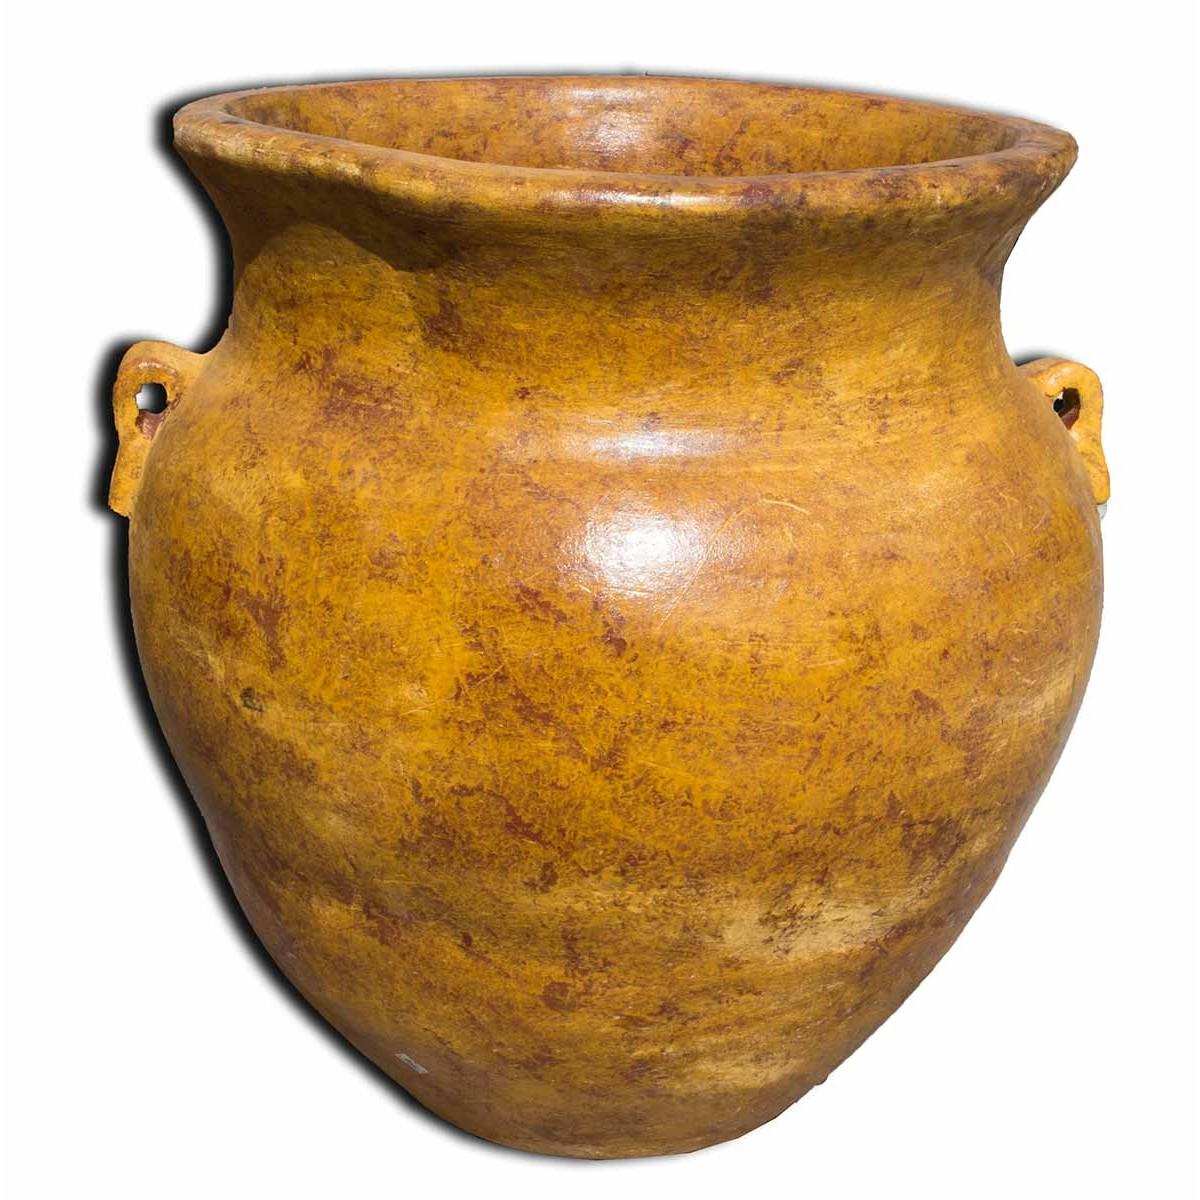 Grand pot de jardin cache pot en terre cuite non g live pour jardin - Grand pot de jardin ...